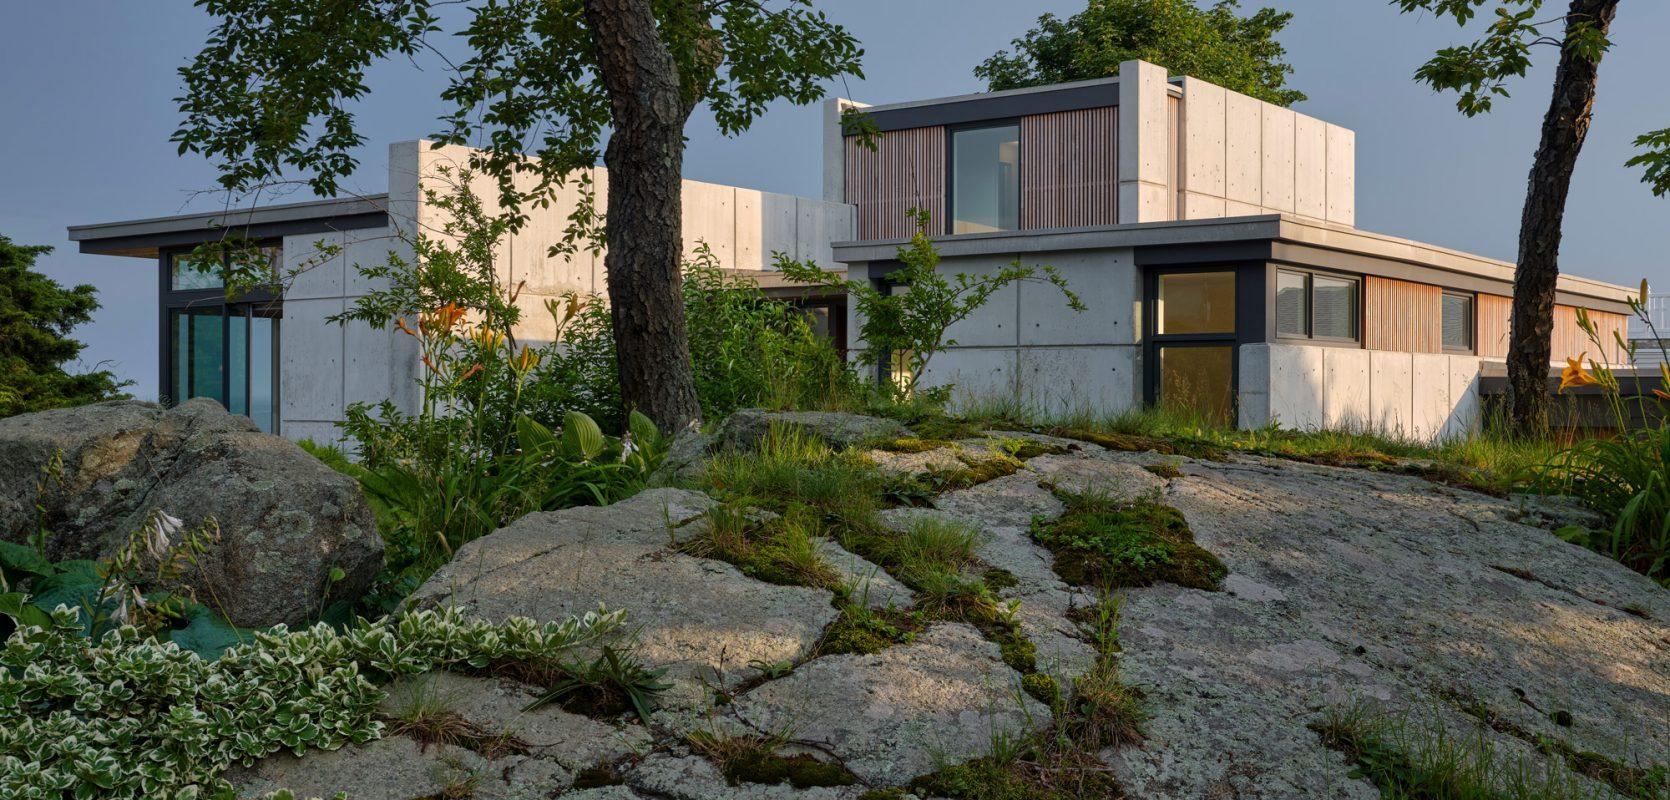 concrete home nestled into landscape with ledge